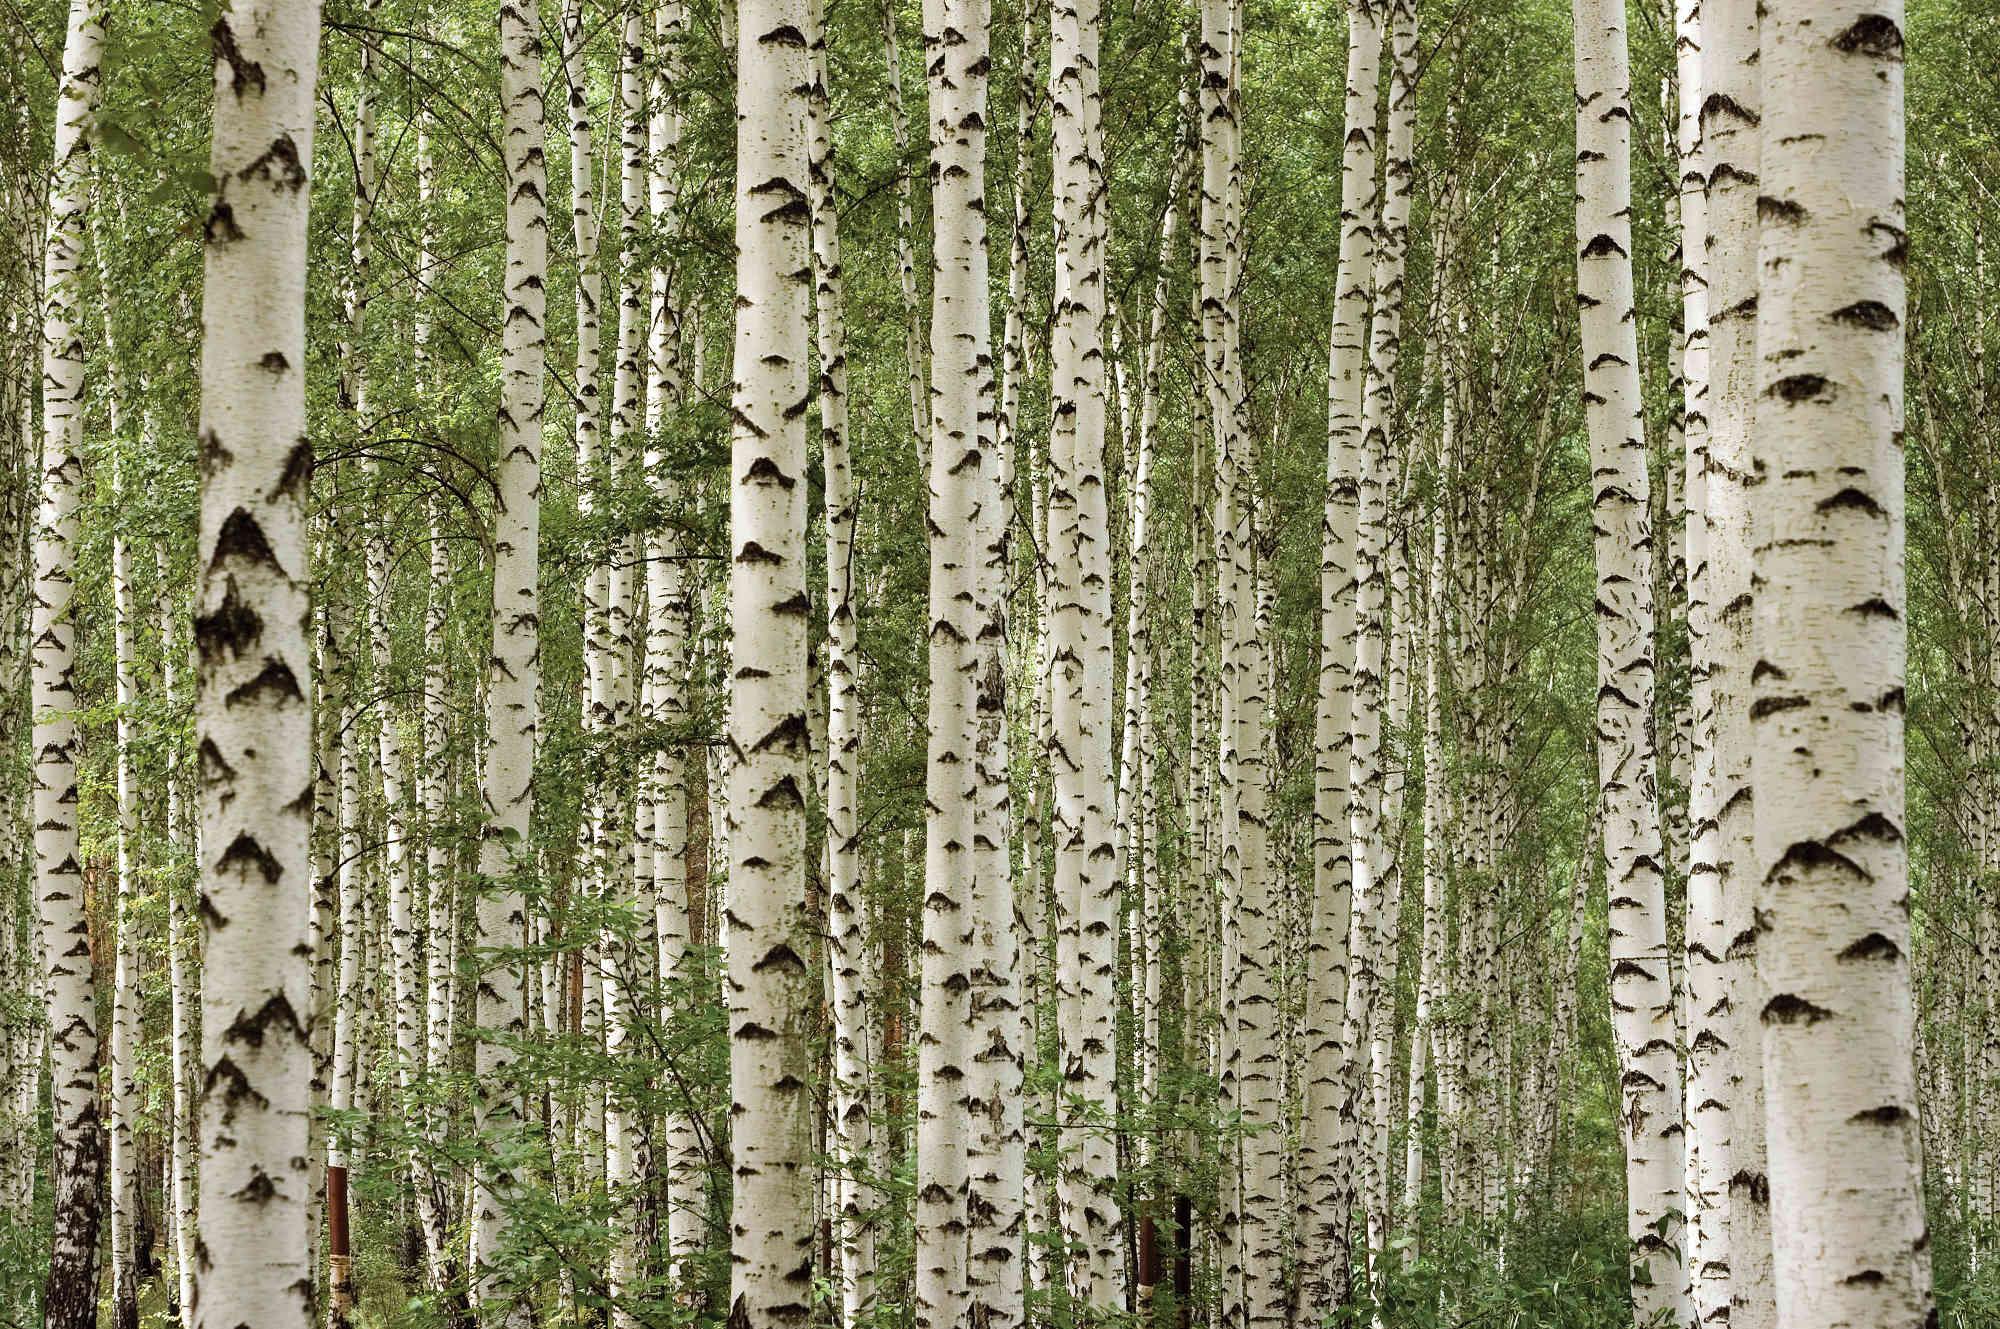 Birch HD wallpapers, Desktop wallpaper - most viewed